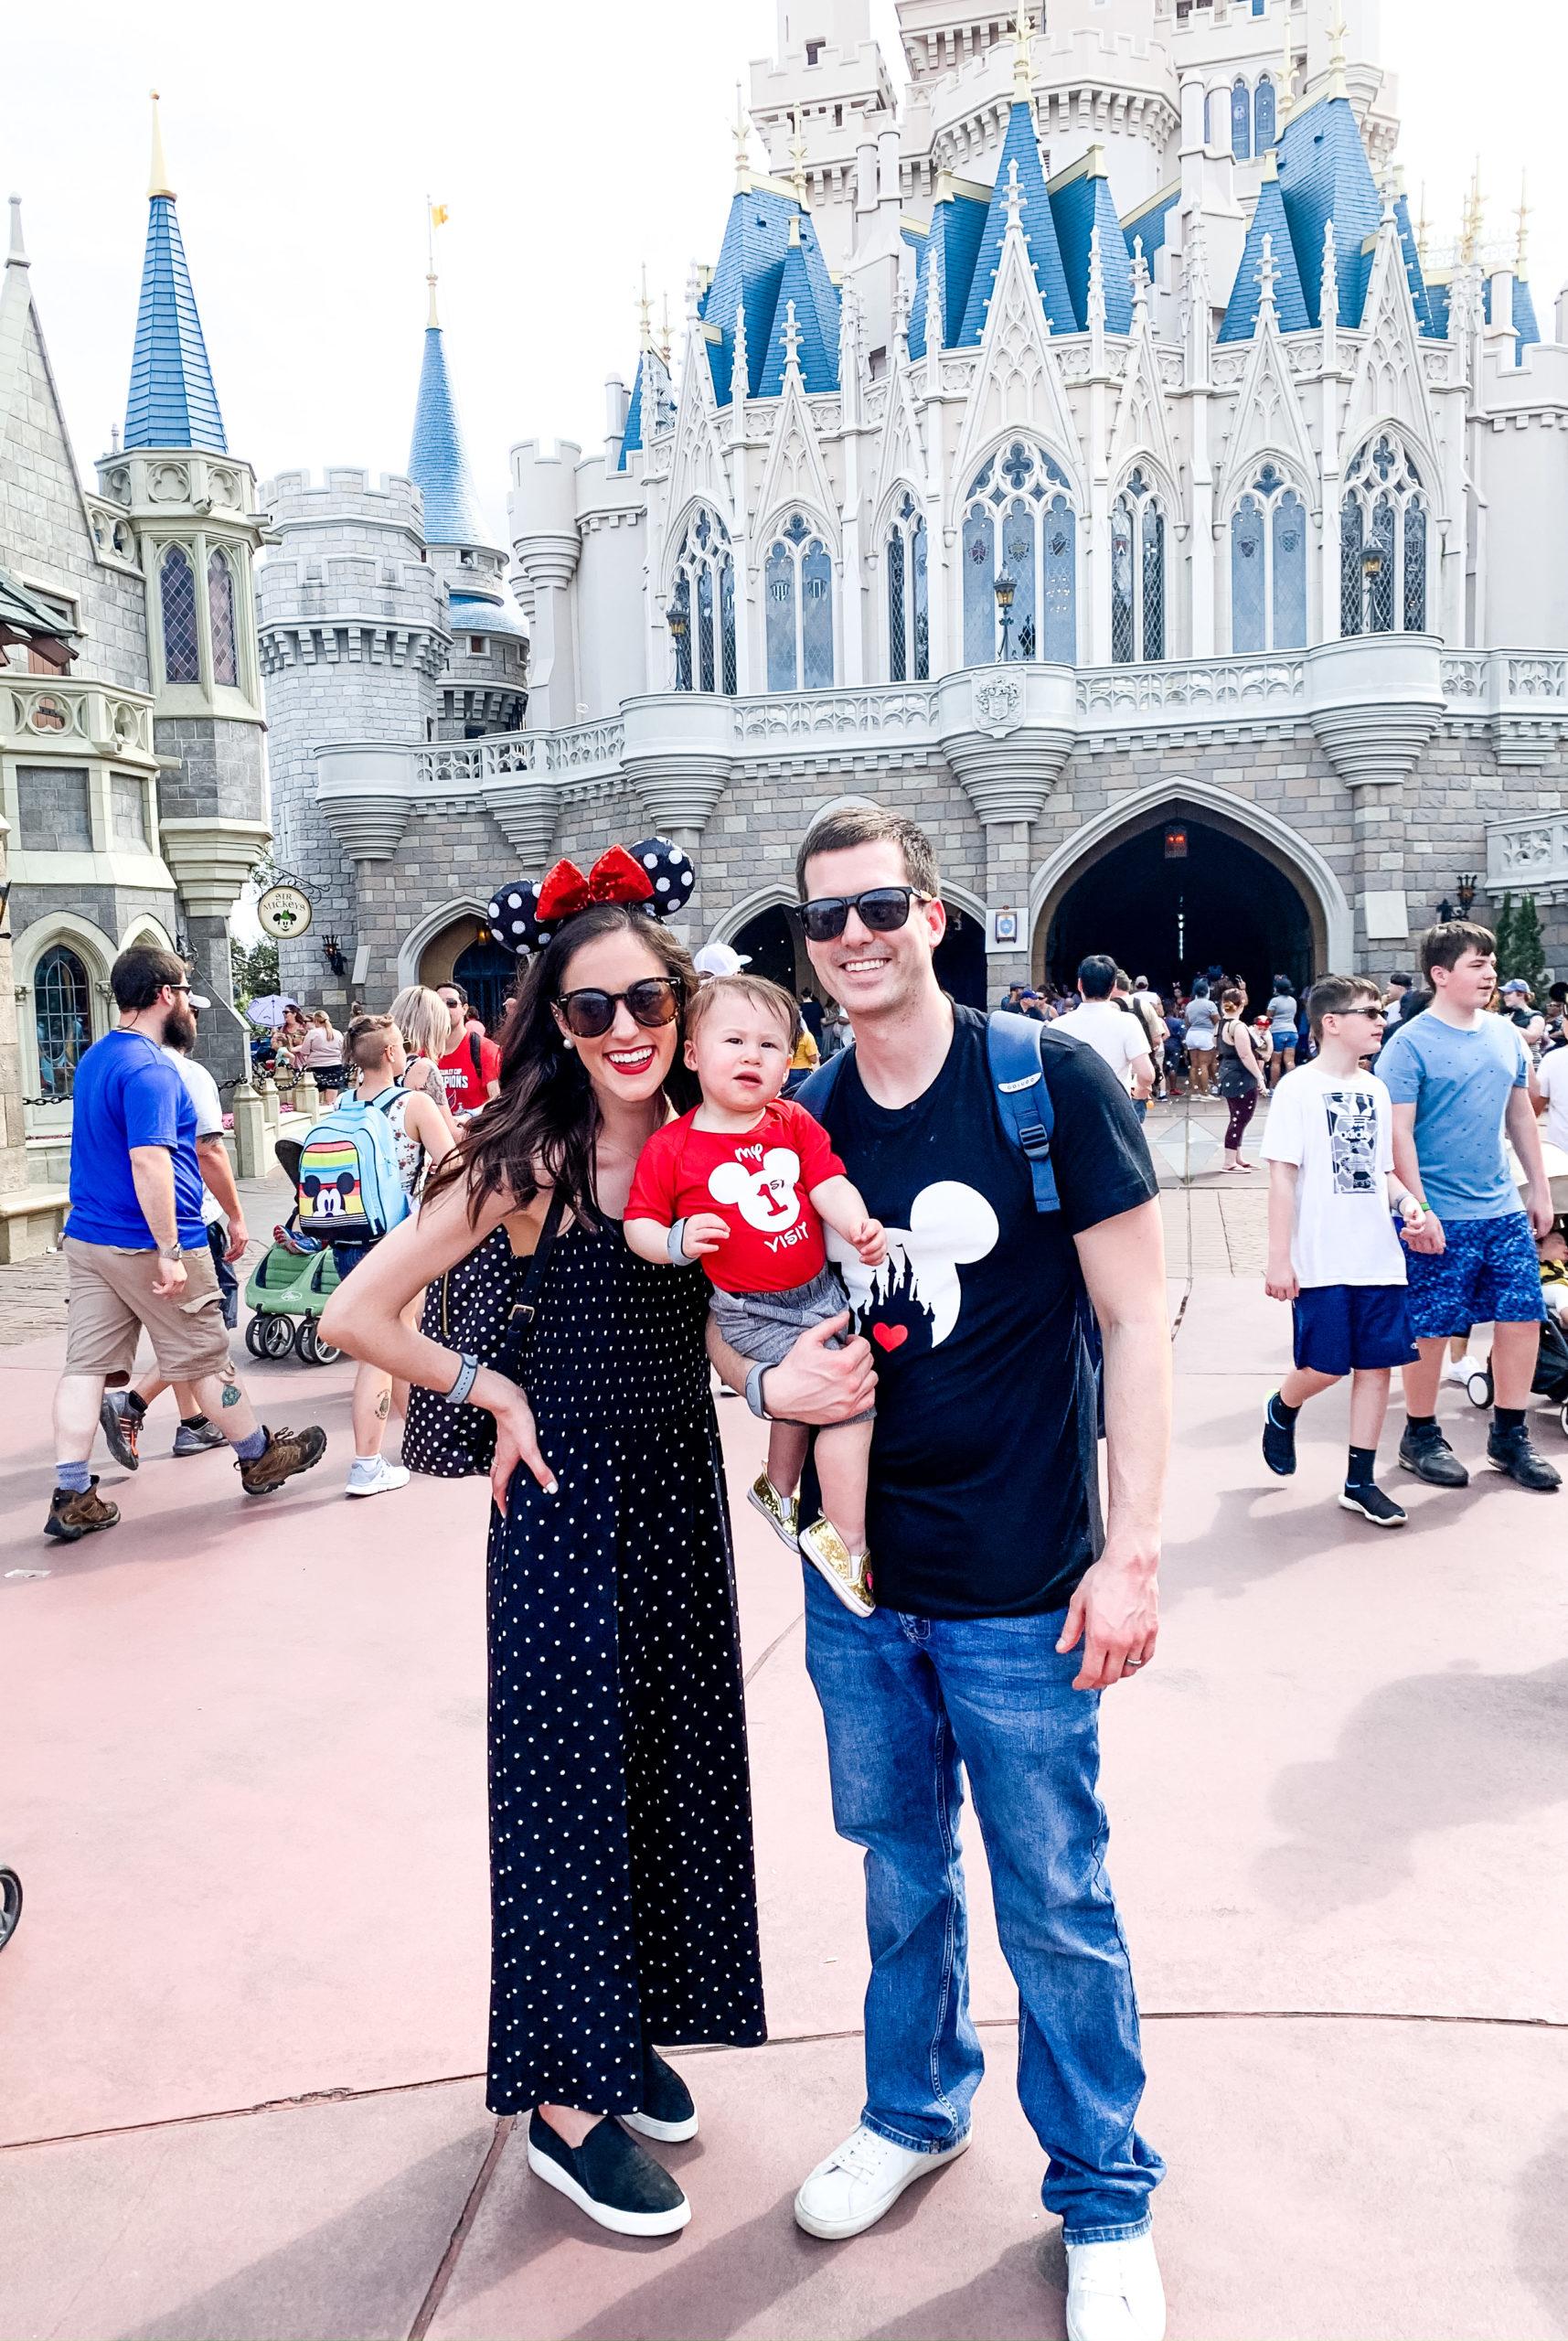 A Full Recap of #DisneyCreatorDays - 7 Days at Disney World and on a Disney Cruise! - Cinderella's Castle in Magic Kingdom